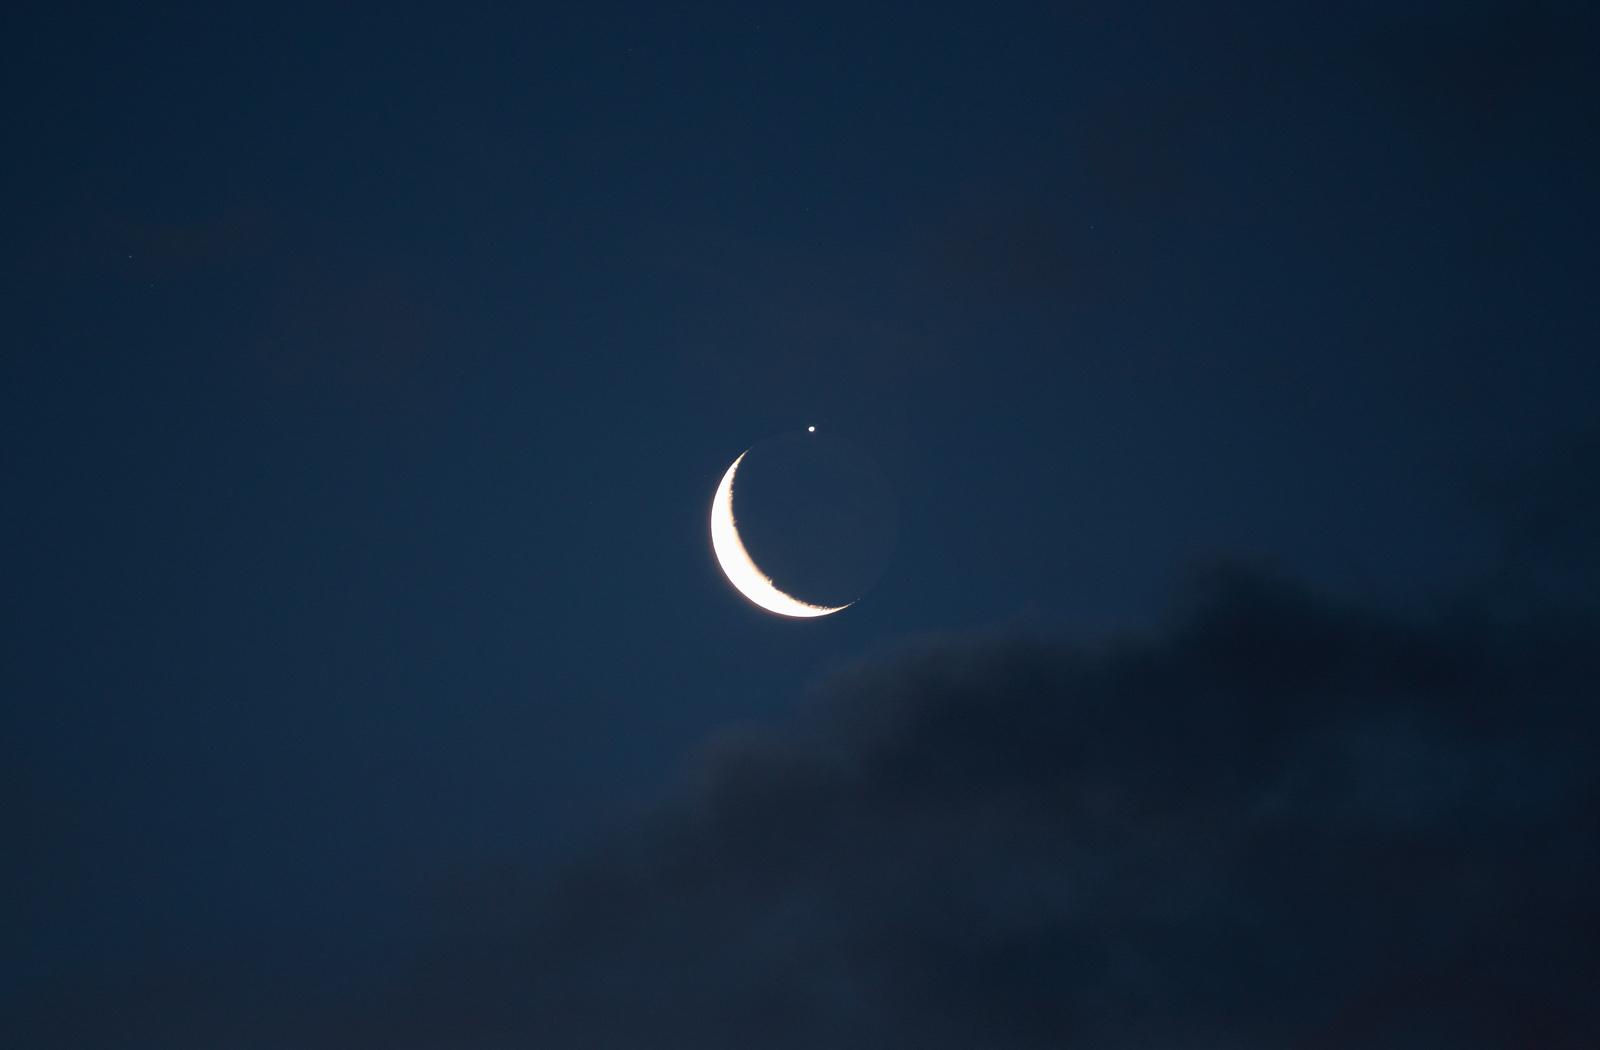 [Bild: B_Jupiter_120715-3.jpg?m=1342431796]